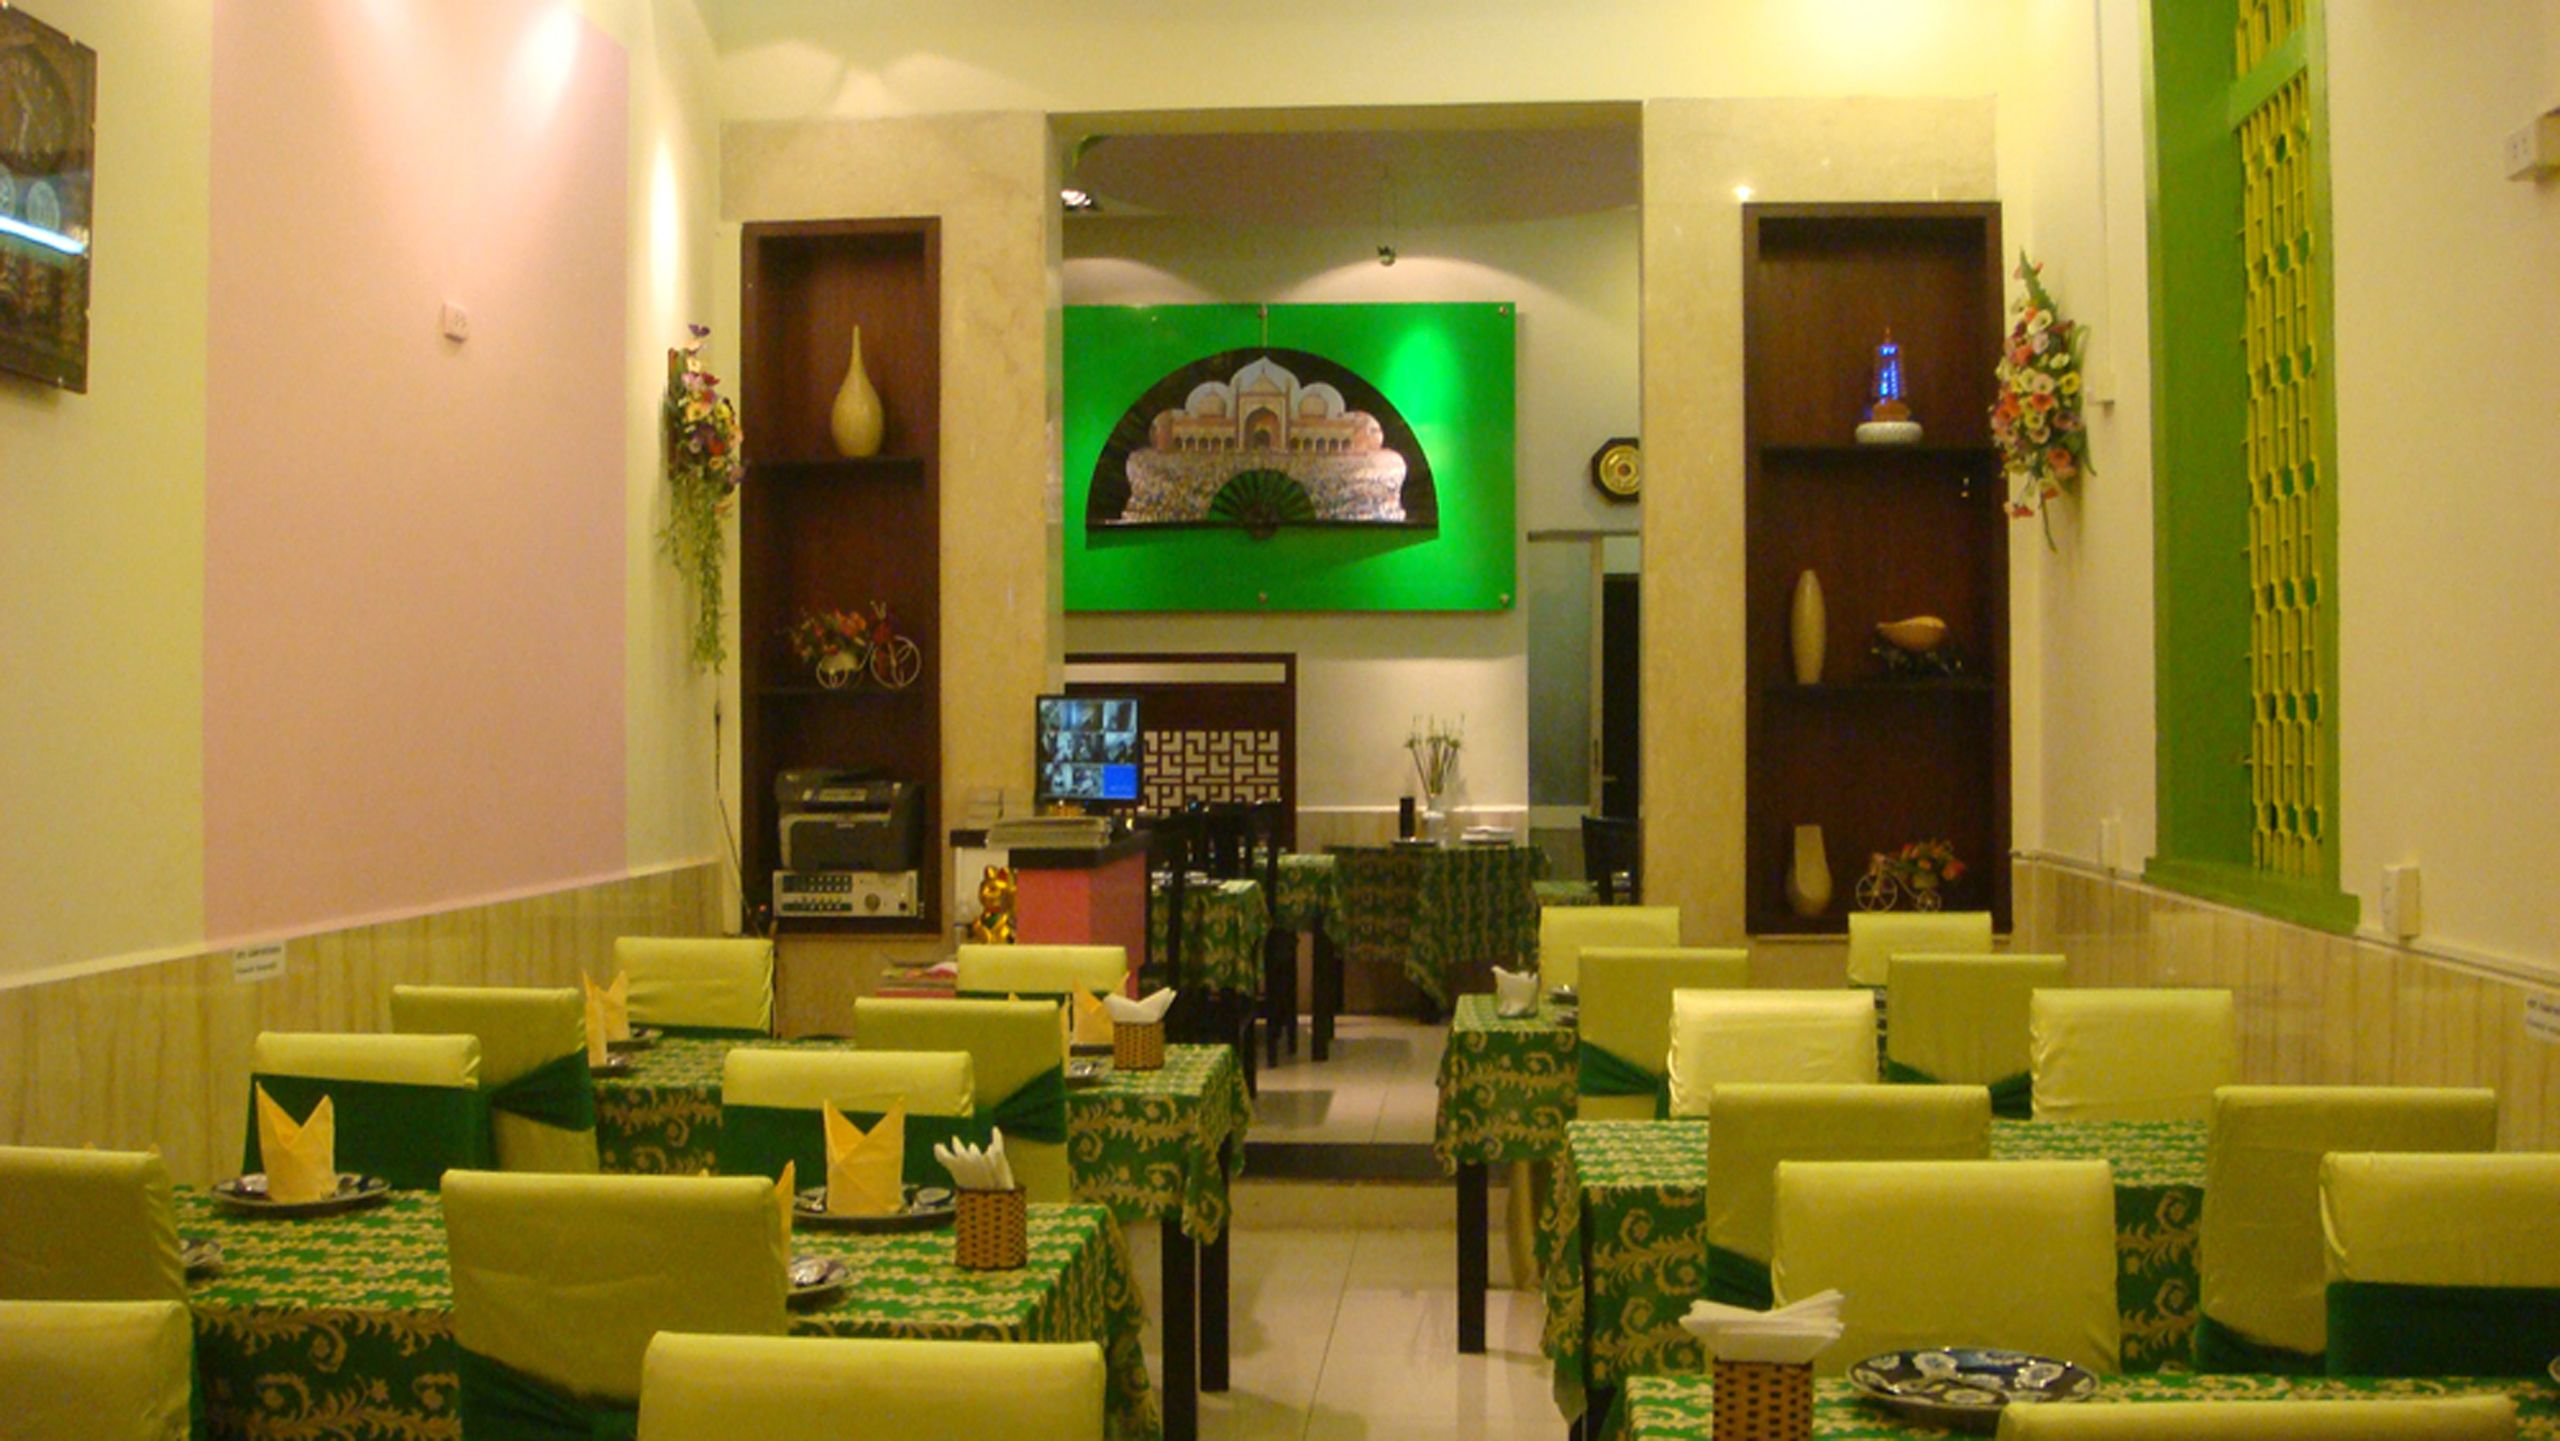 Kampung Pandan - certified halal restaurant in Ho Chi Minh city  - Yallavietnam